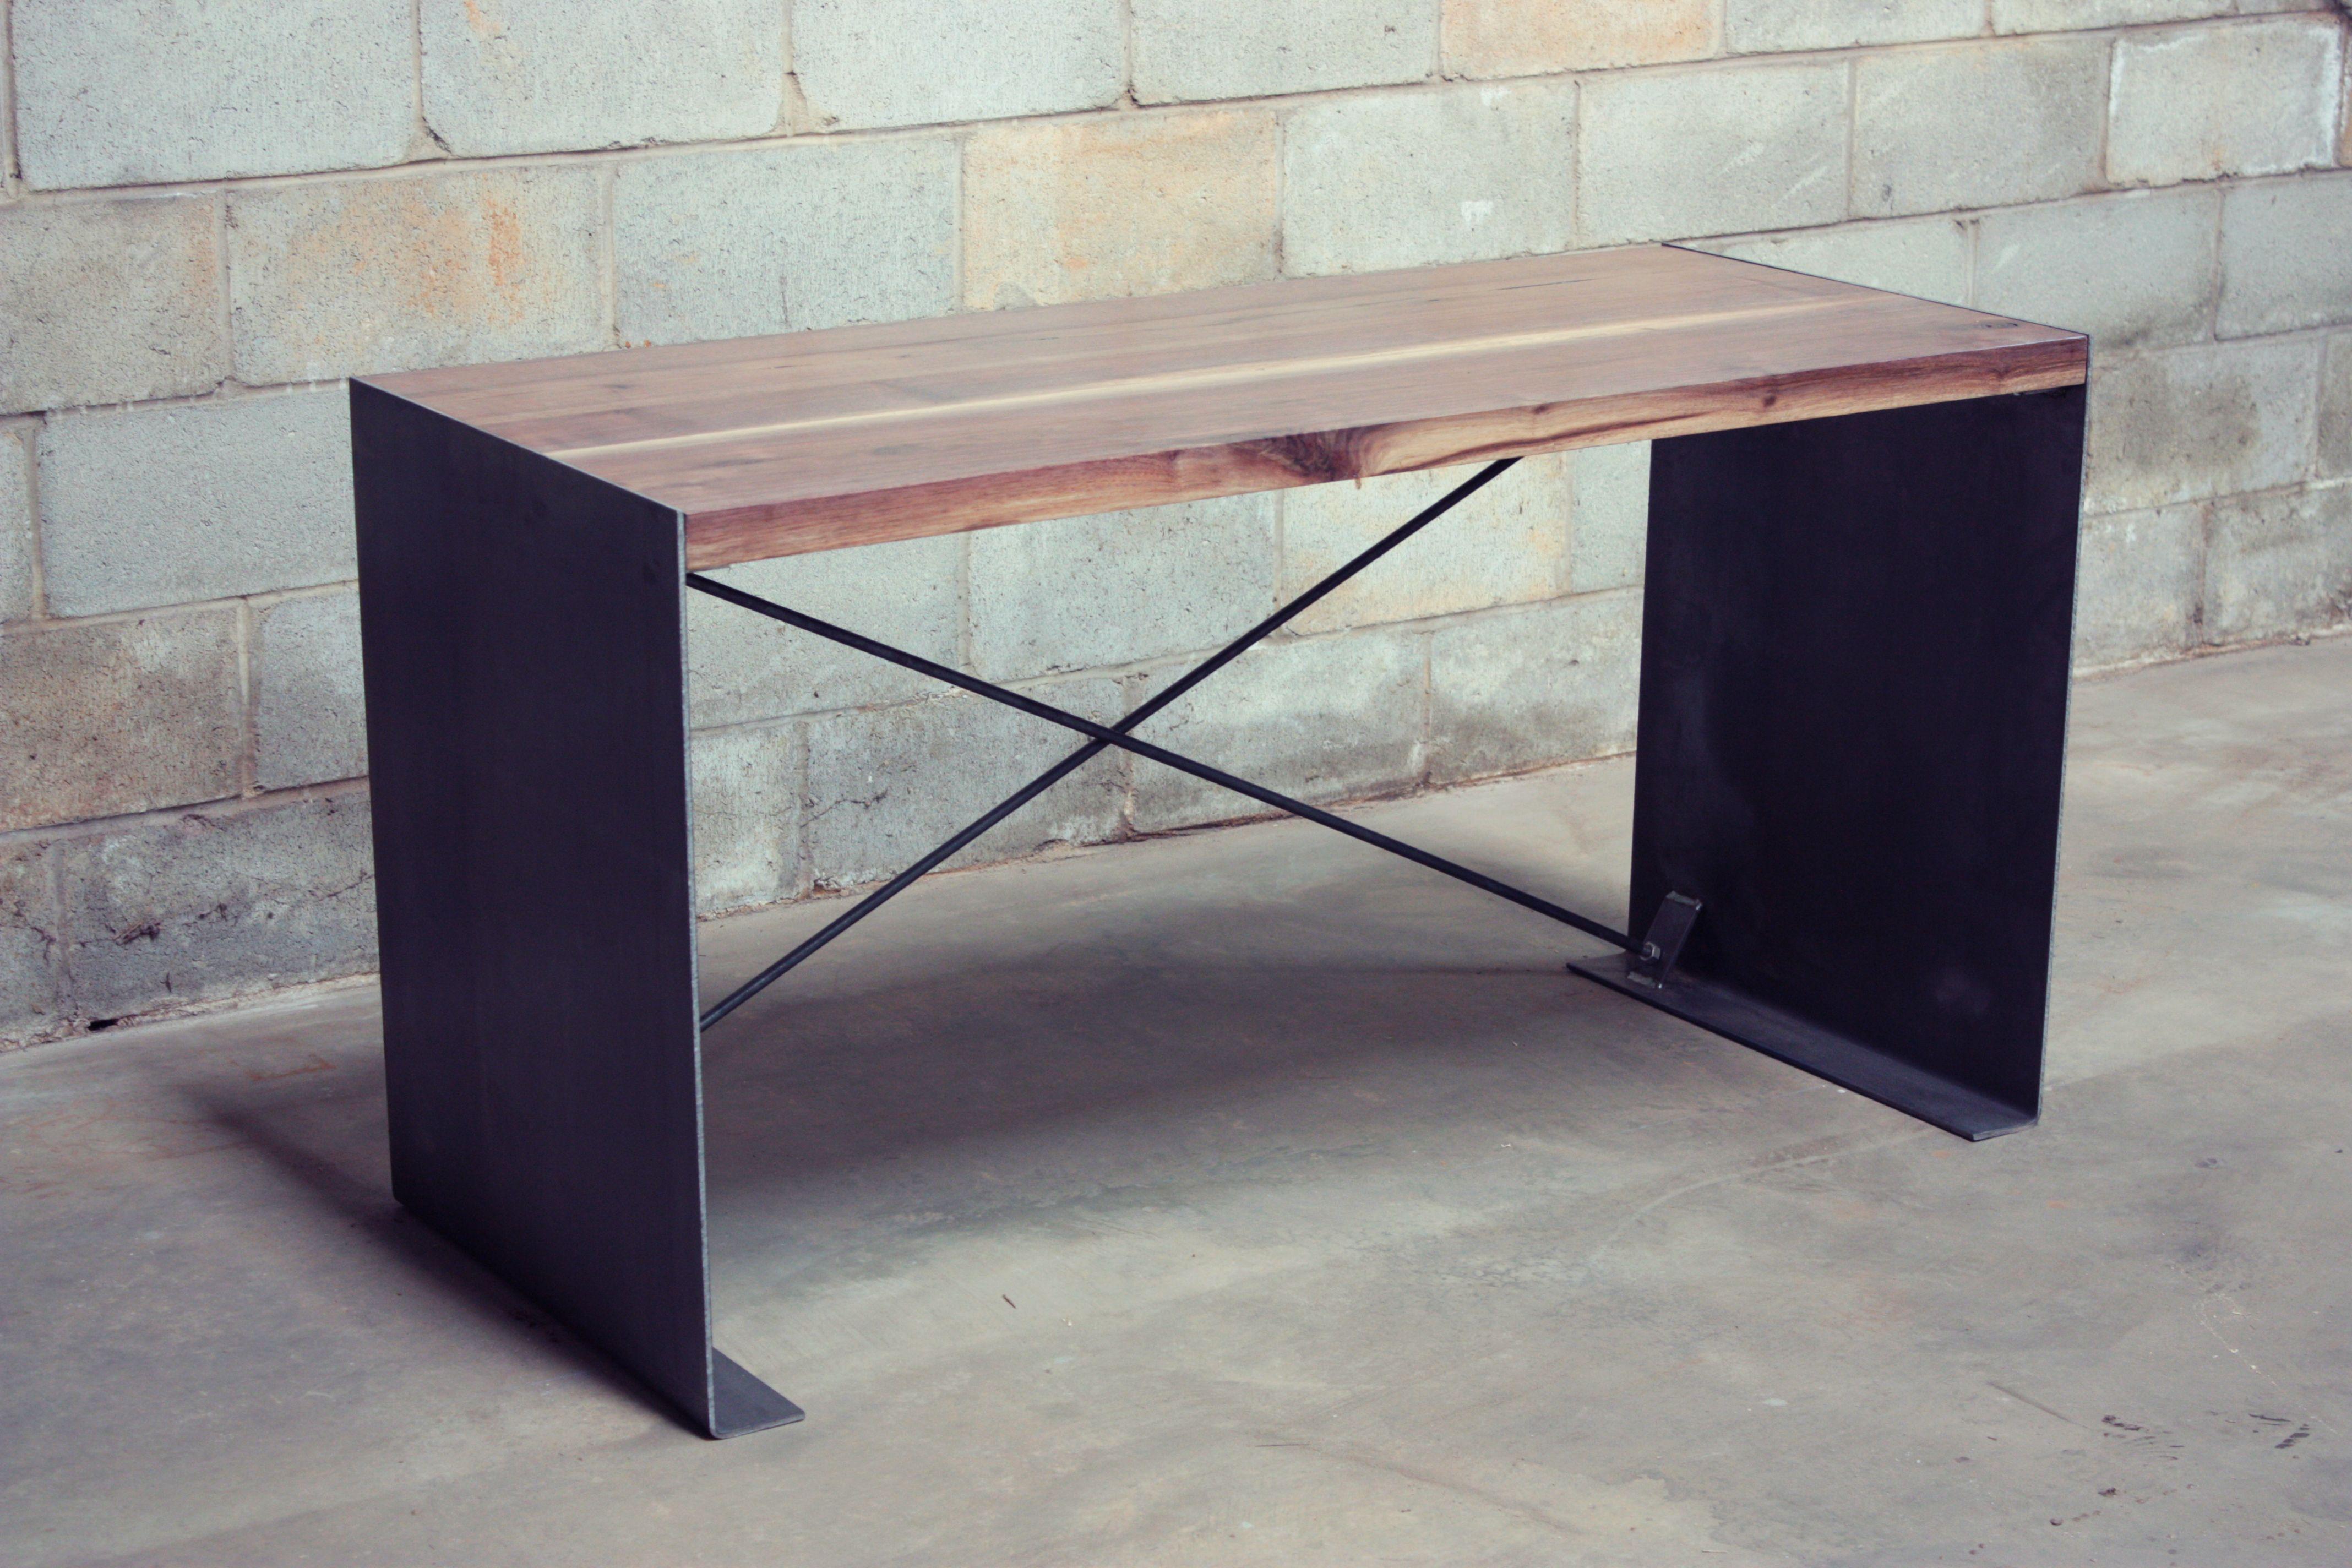 5ae137f63ec0d0c3c4400ee78386b9a1 Impressionnant De Table Transformable Concept